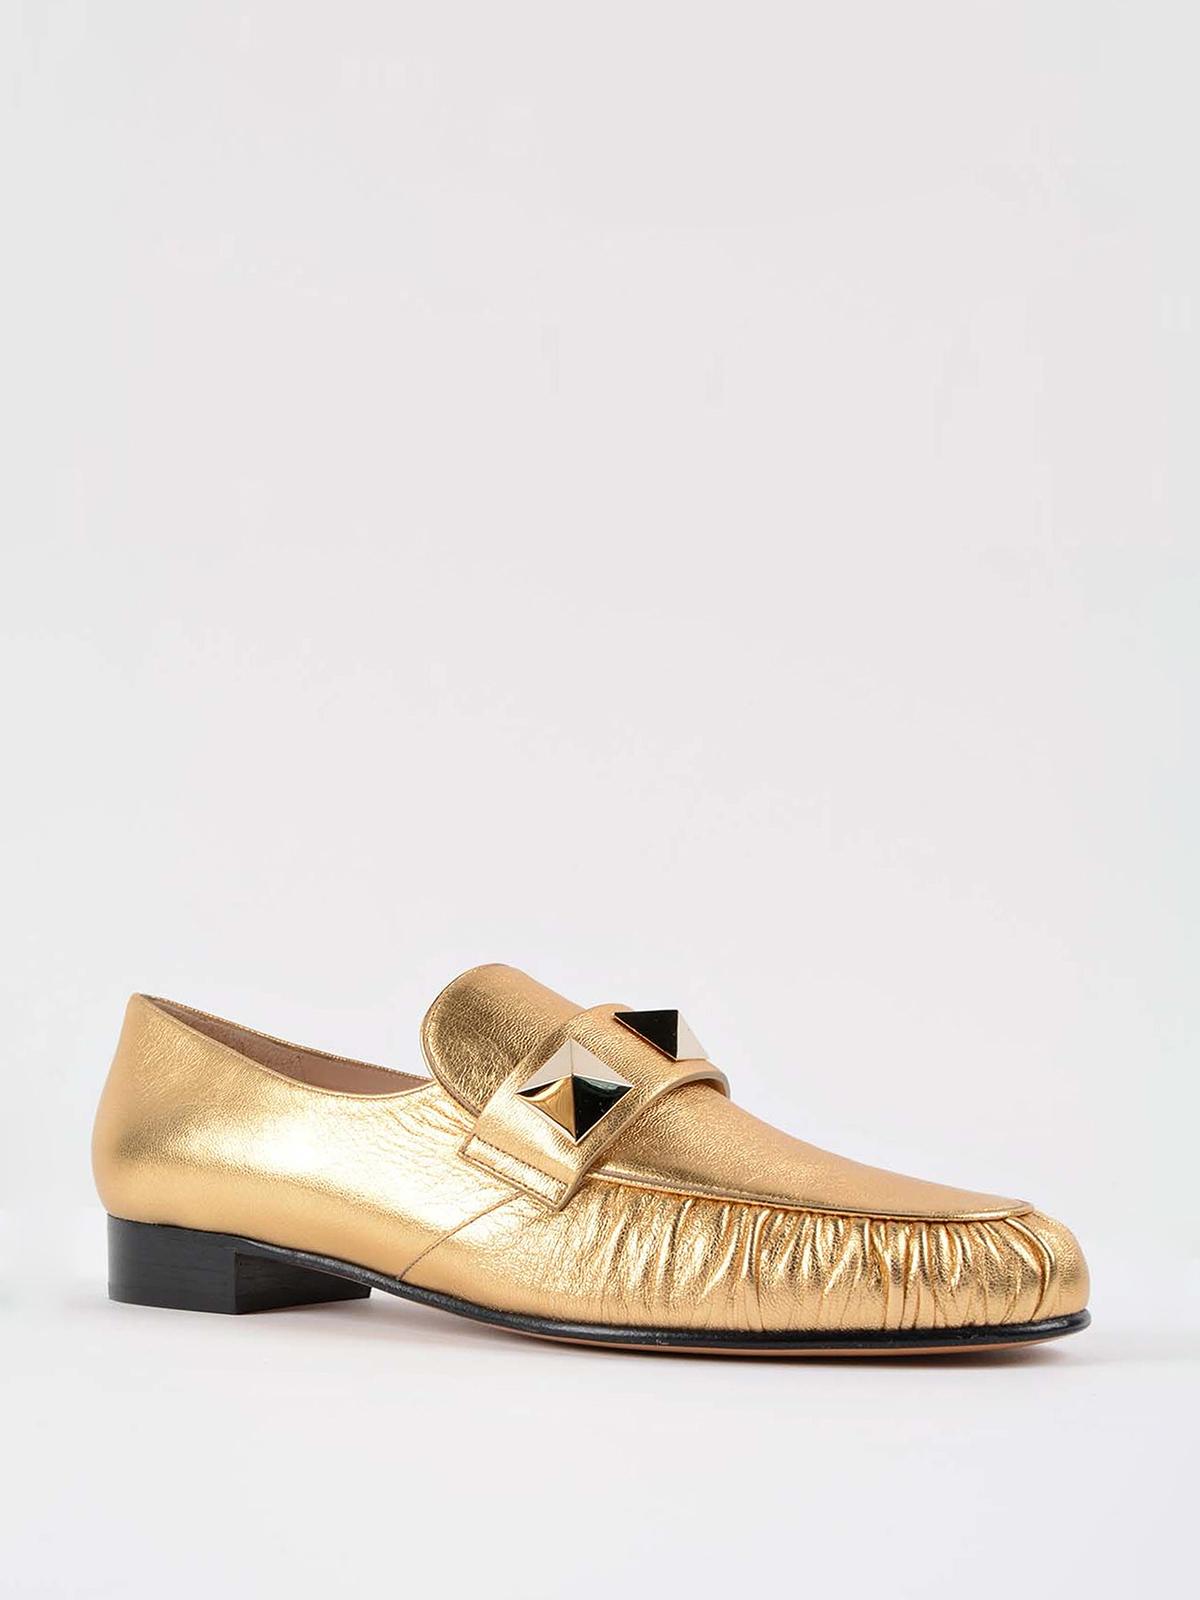 95558484410 VALENTINO GARAVANI  Loafers   Slippers online - Macro studs detail loafers